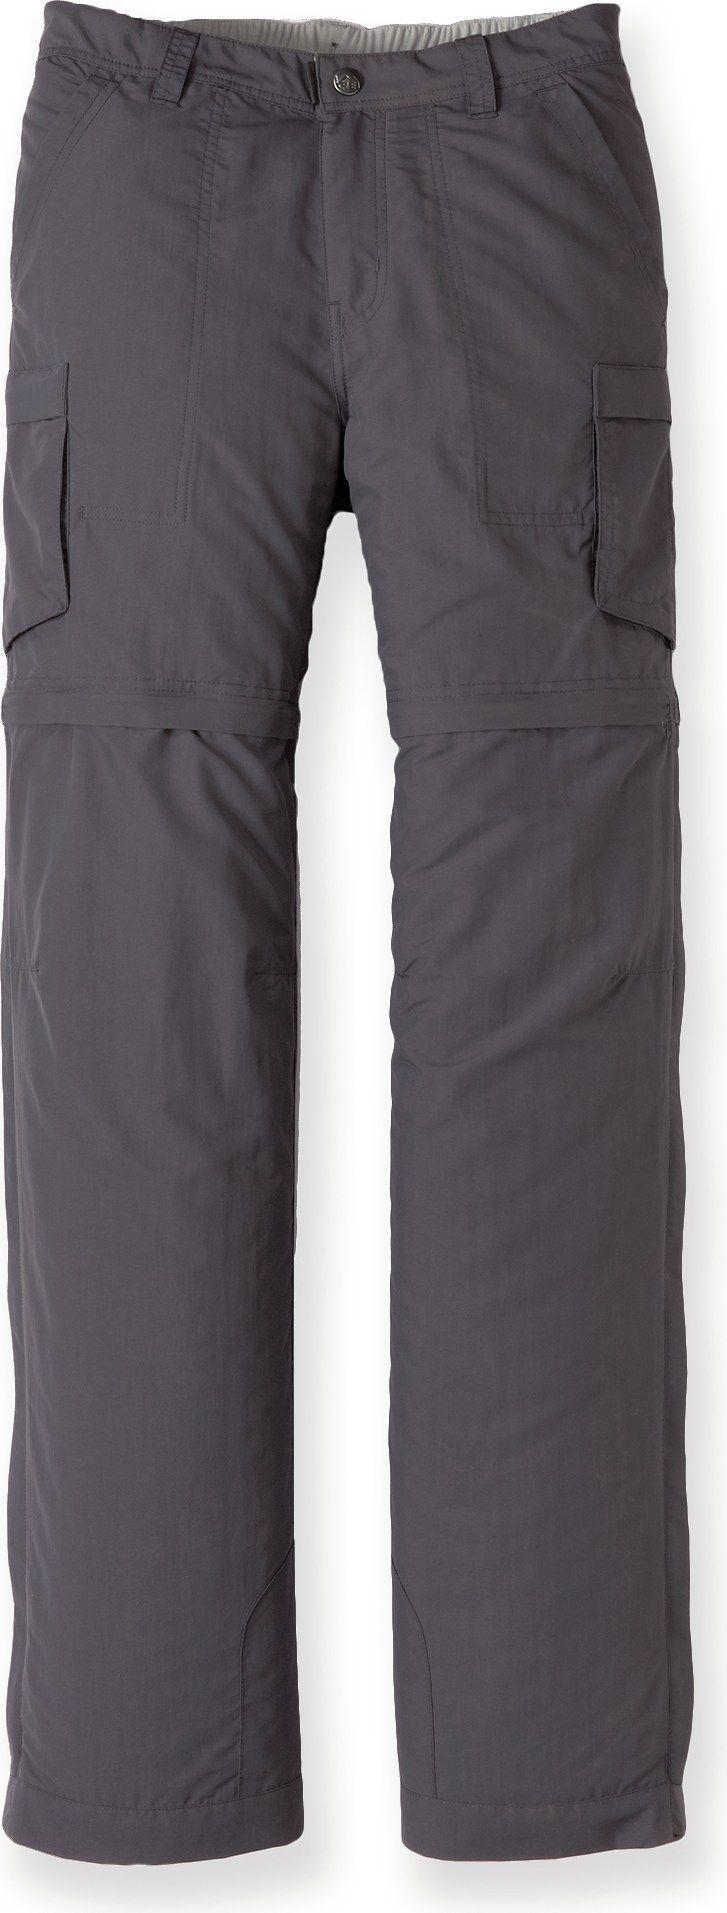 REI Sahara Convertible Pants - Women's Plus Sizes - REI.com